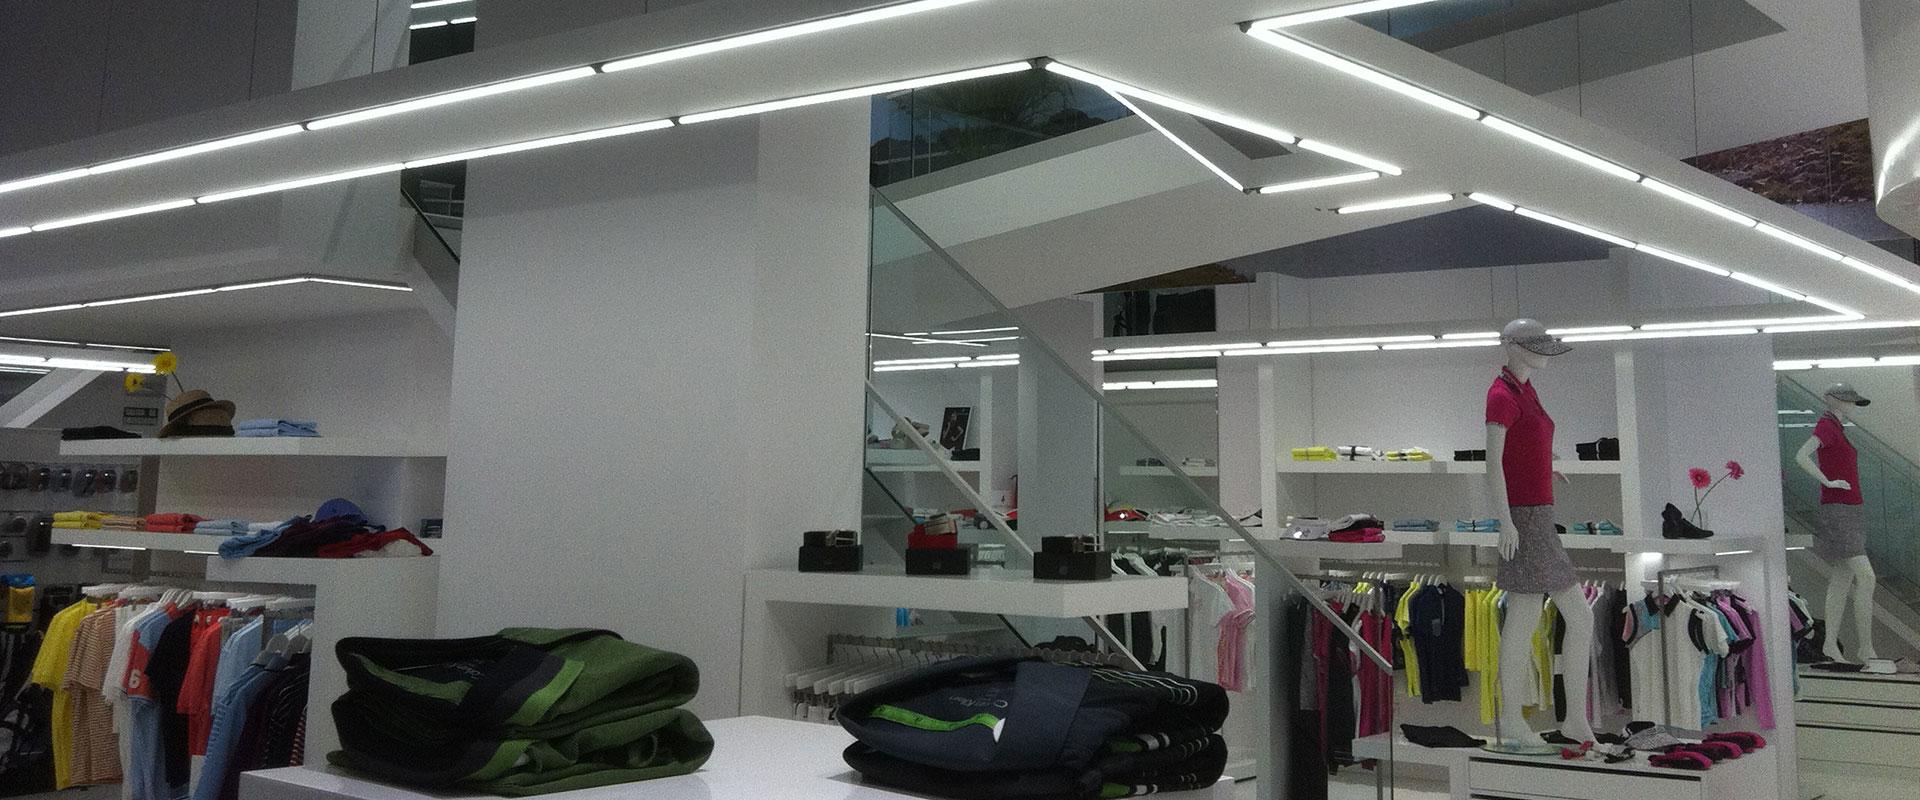 iluminacao-comercial-LED-golf-puerto1